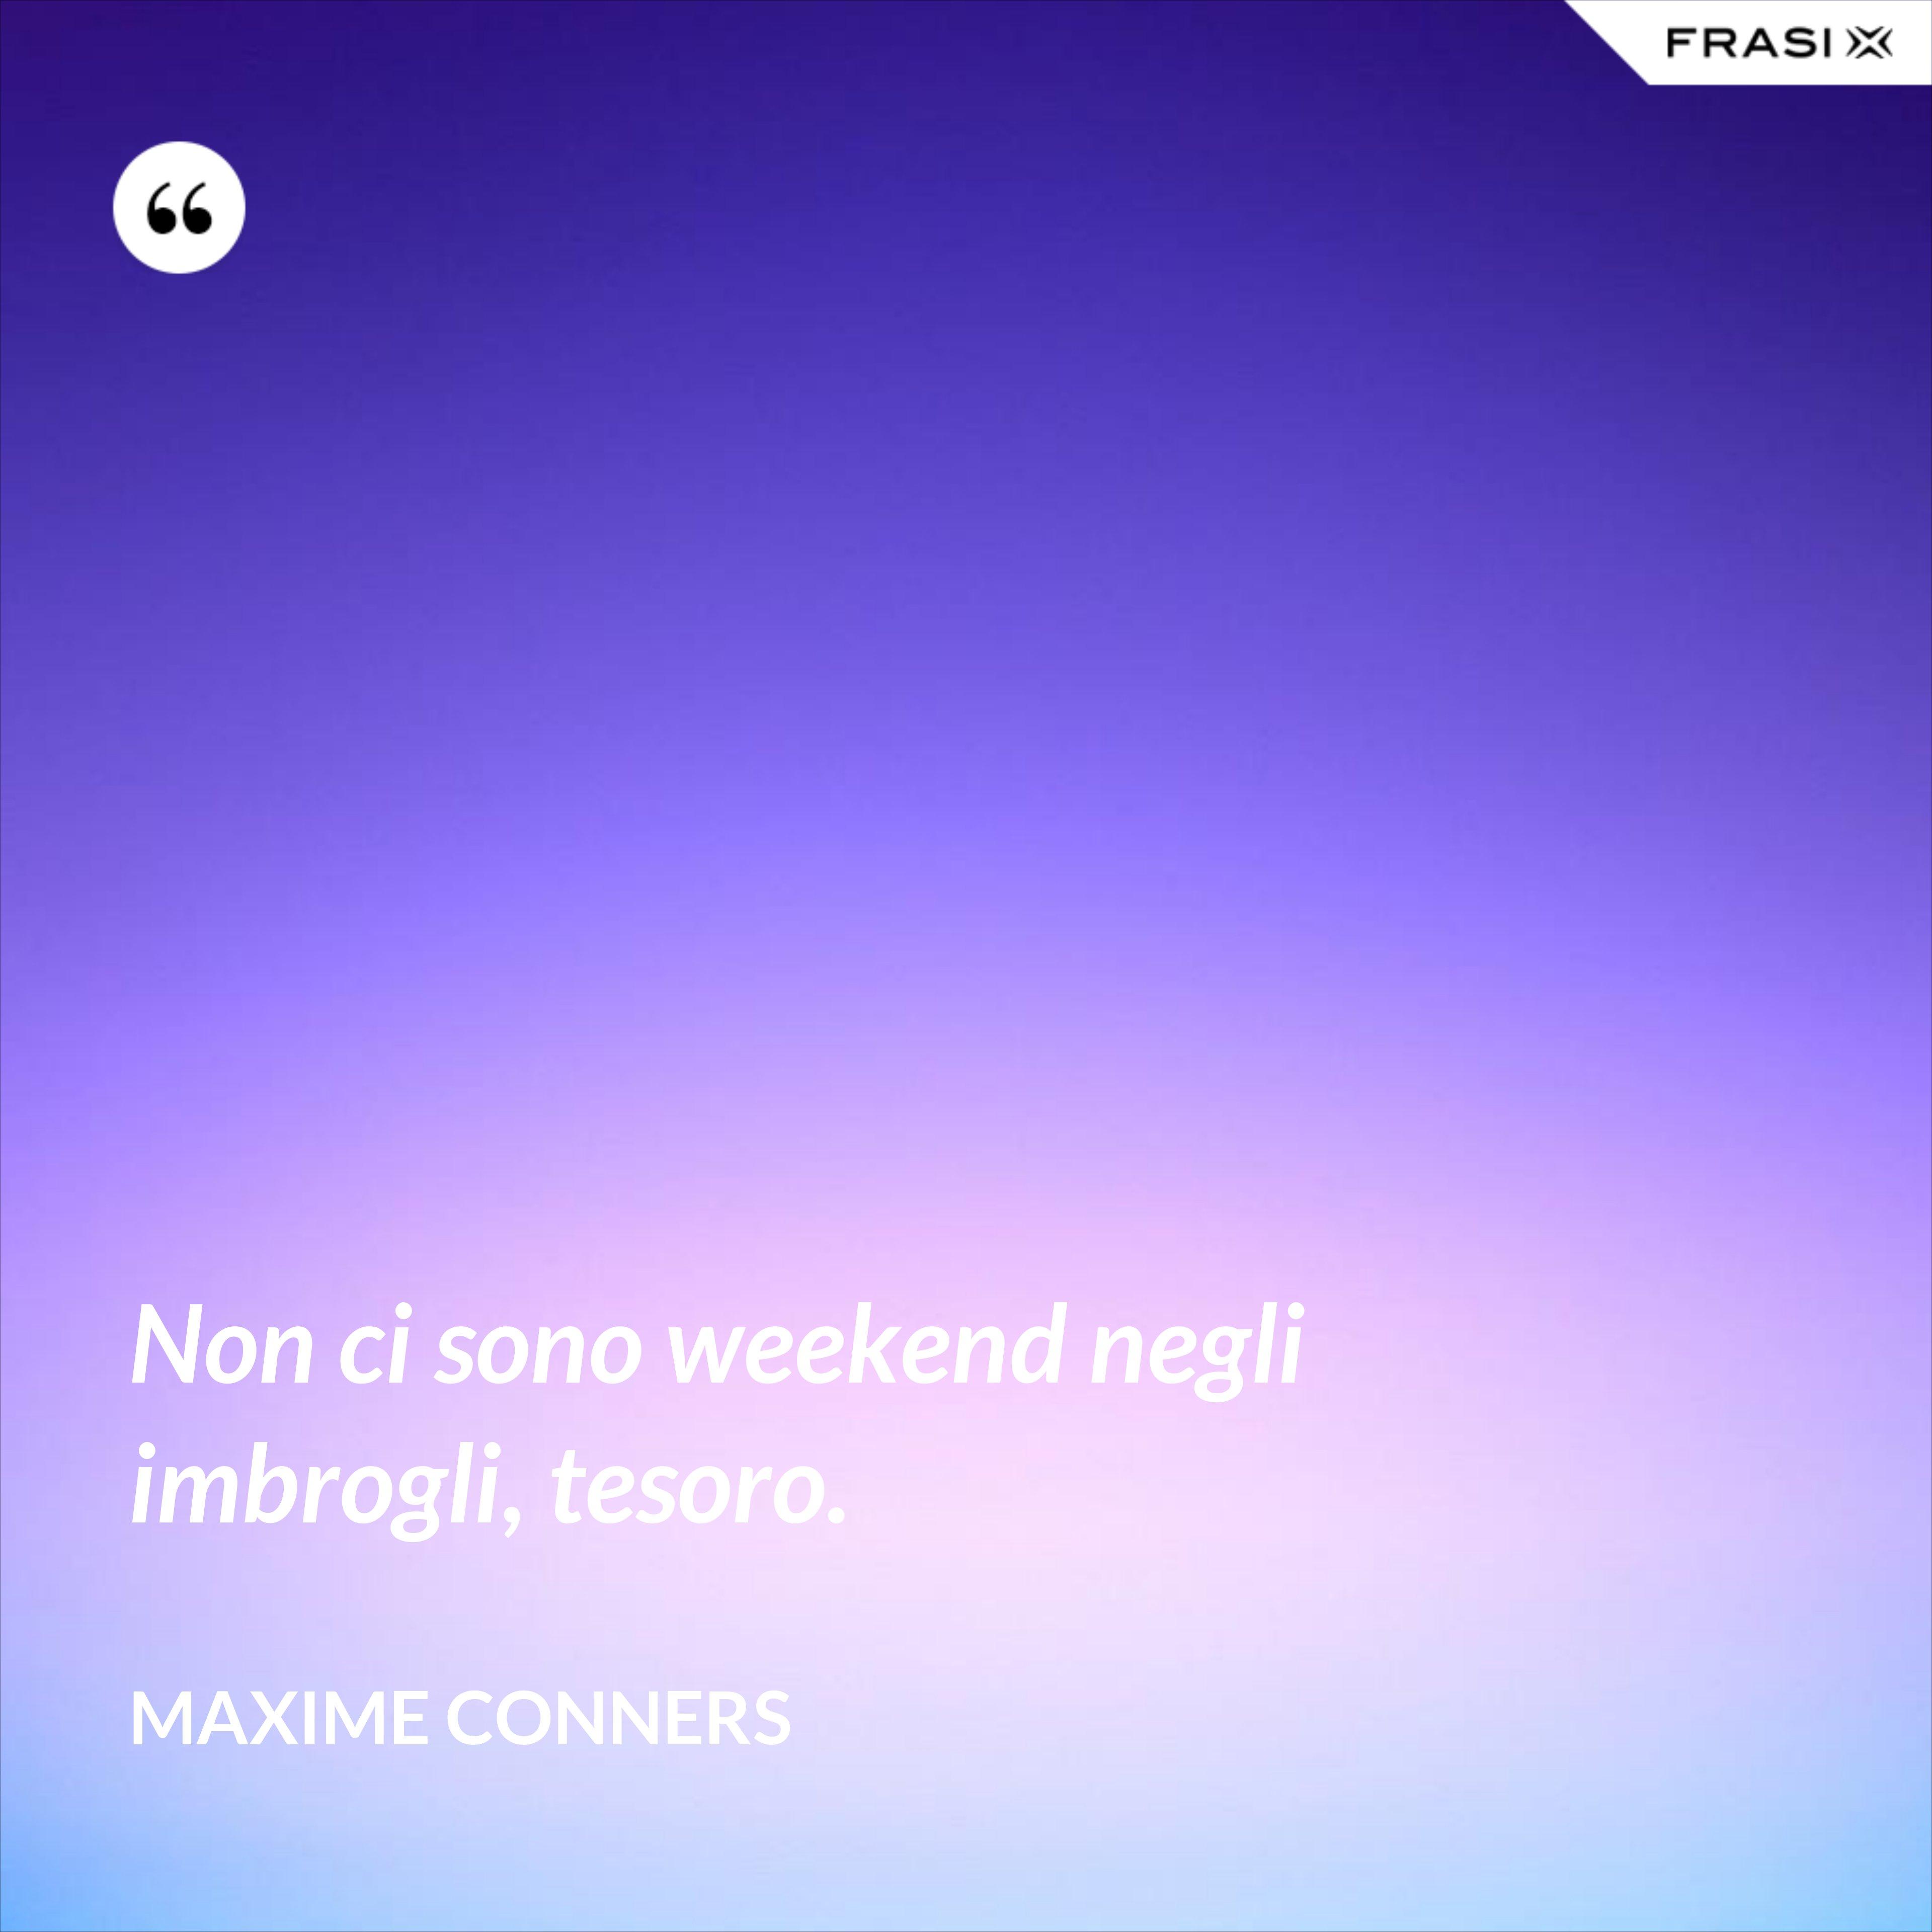 Non ci sono weekend negli imbrogli, tesoro. - Maxime Conners